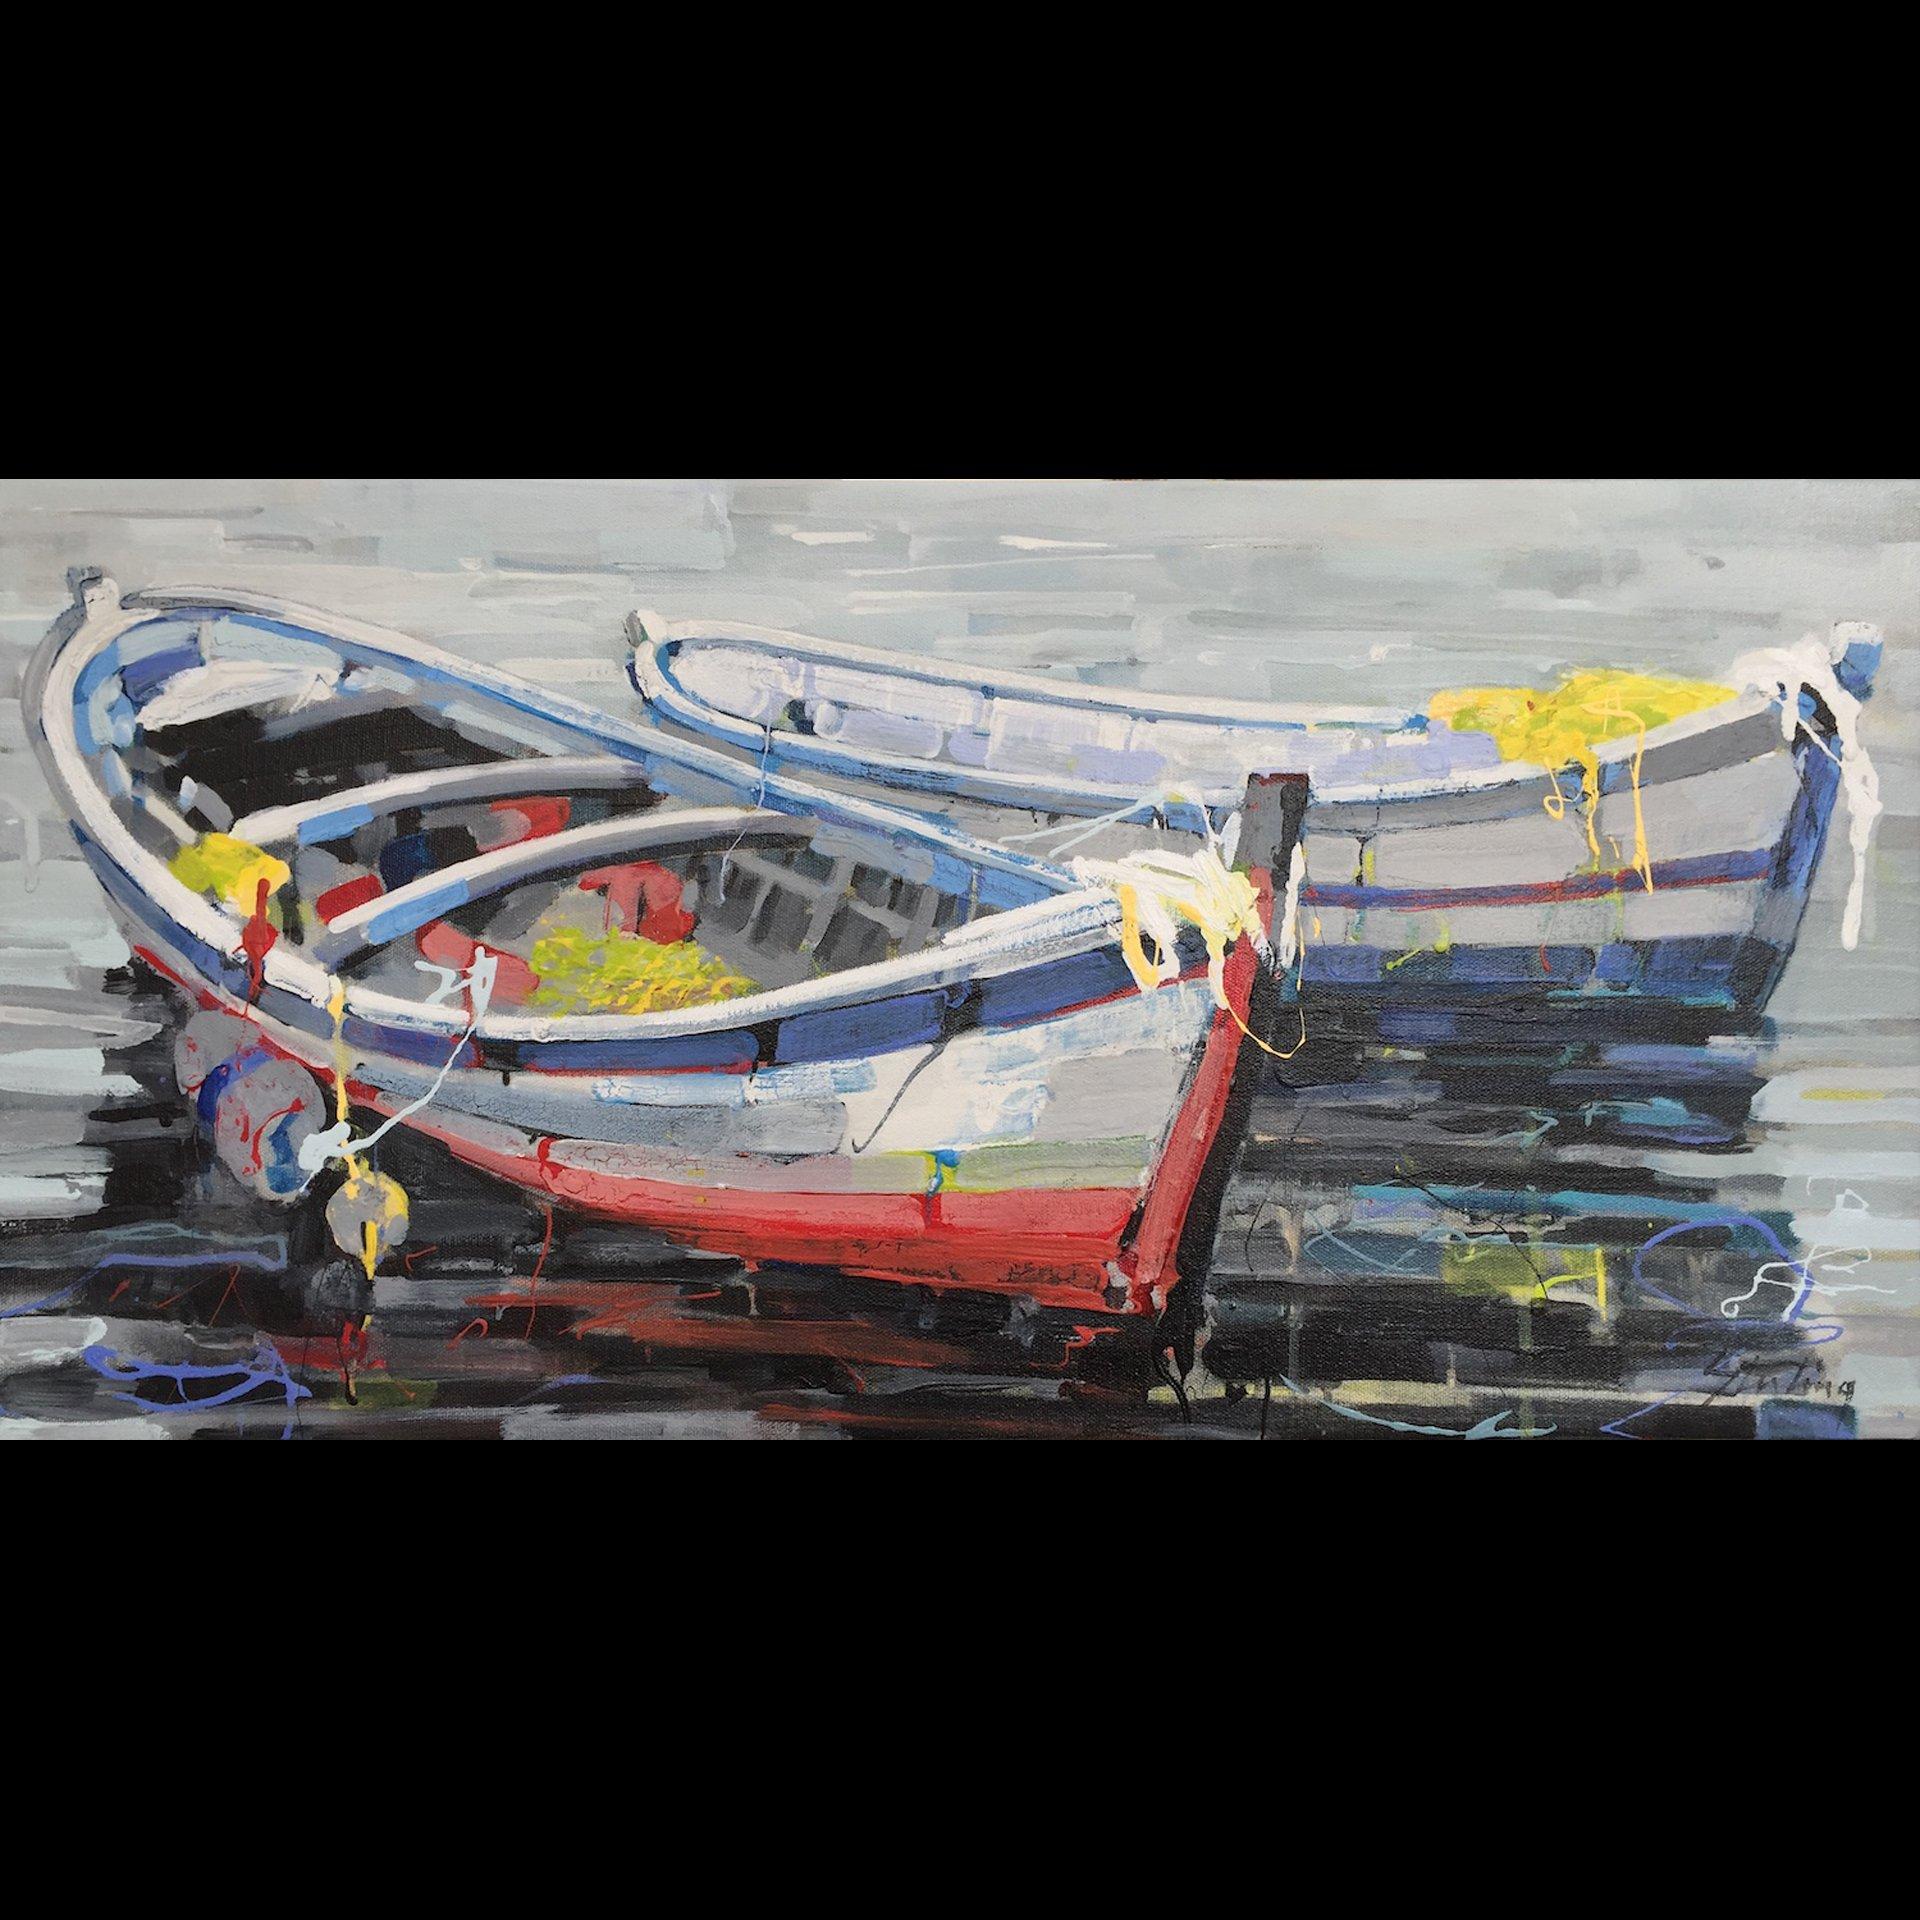 Marine Layer acrylic on canvas 12x24 SOLD